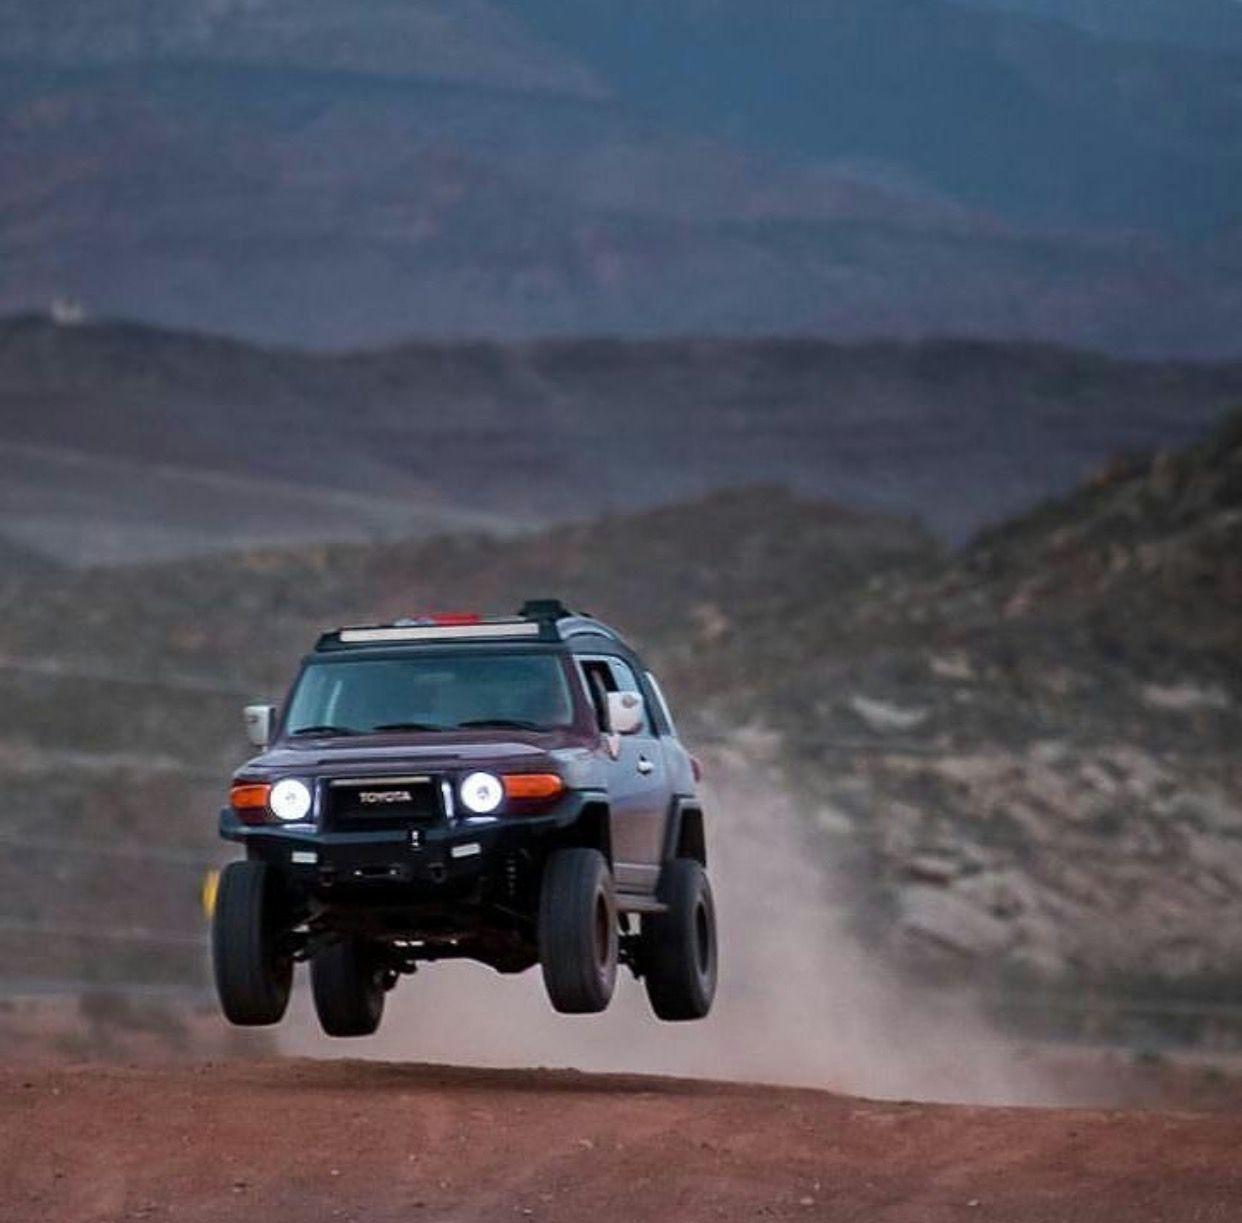 FJ Cruiser Roof Rack: Toyota FJ Cruiser Roof Rack Safari